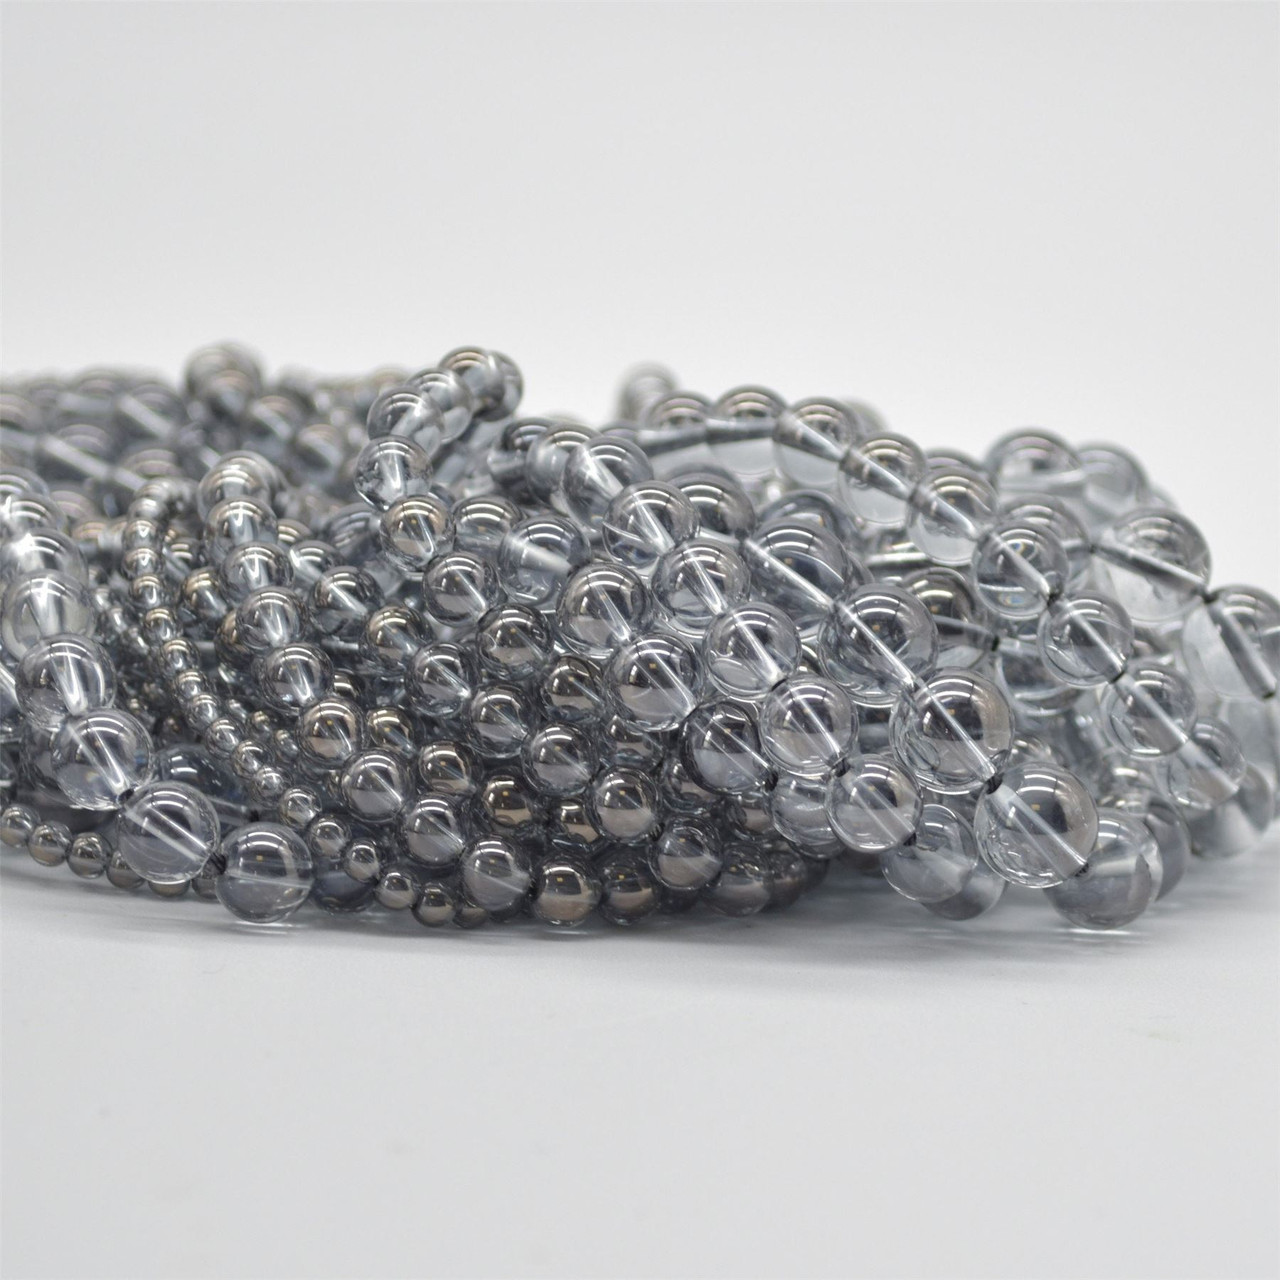 High Quality Grade A Natural Grey Quartz Semi-precious Gemstone Round Beads 8mm 6mm Approx 15.5 strand 10mm sizes 4mm